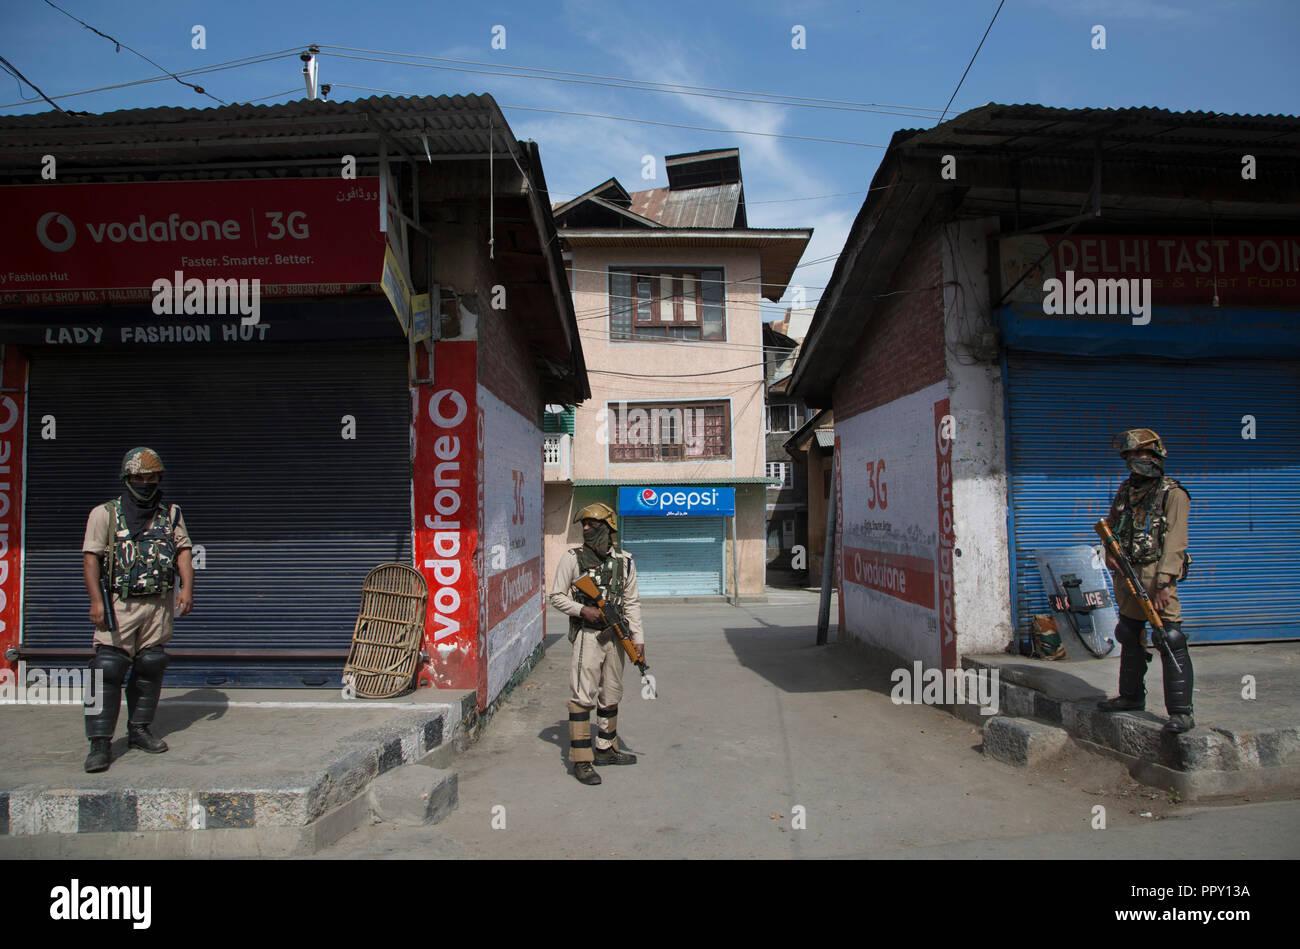 180928) -- SRINAGAR, Sept  28, 2018 (Xinhua) -- Indian